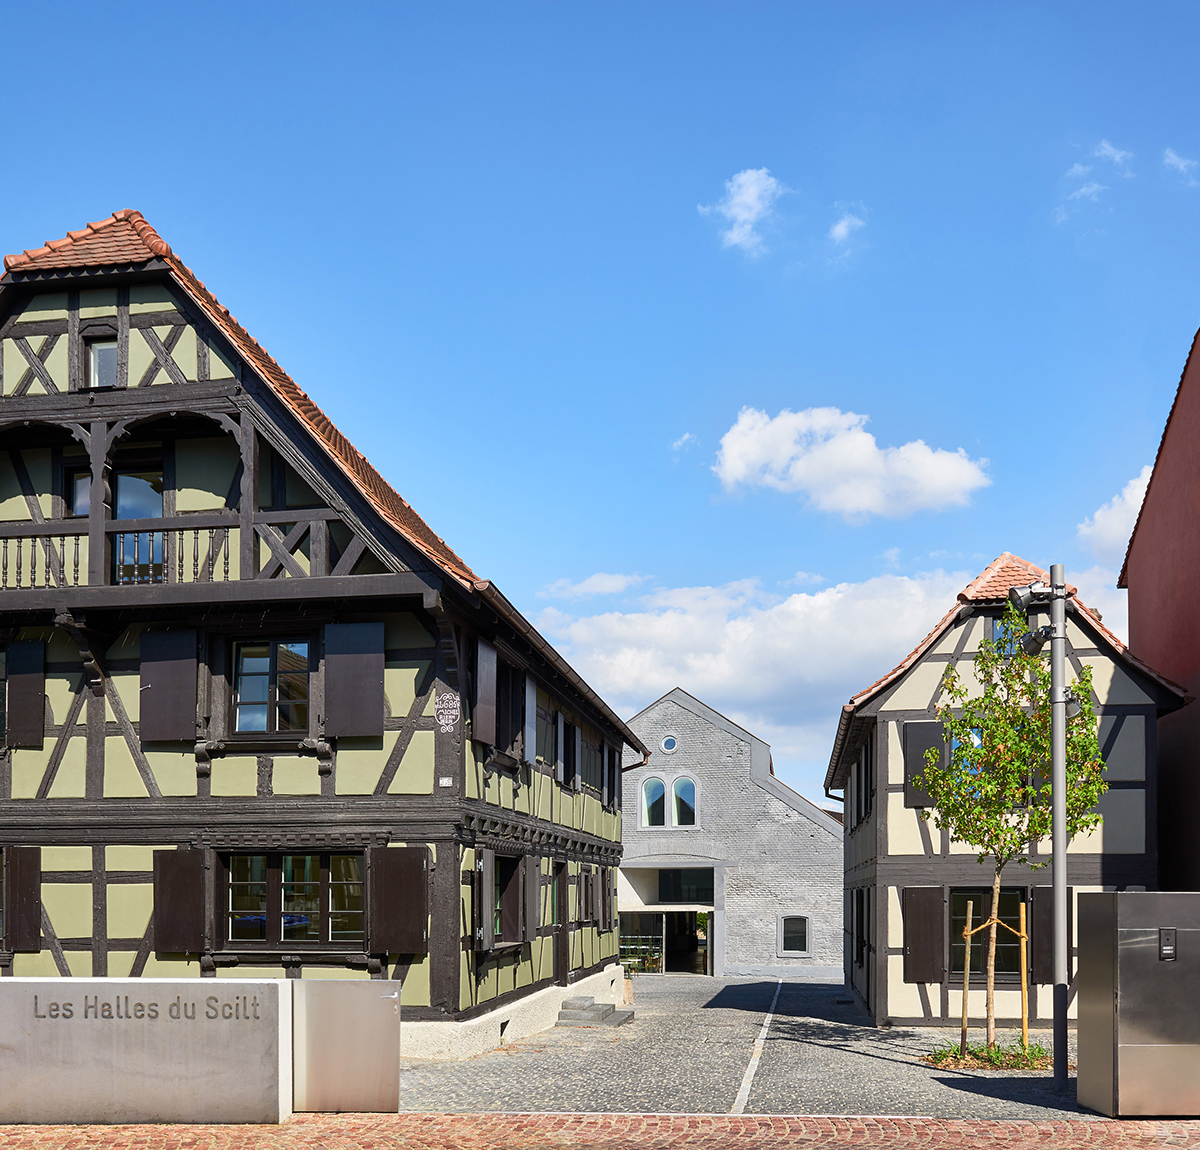 Covered-market-exhibition-area-Schiltigheim-Dominique-Coulon-Associes-02